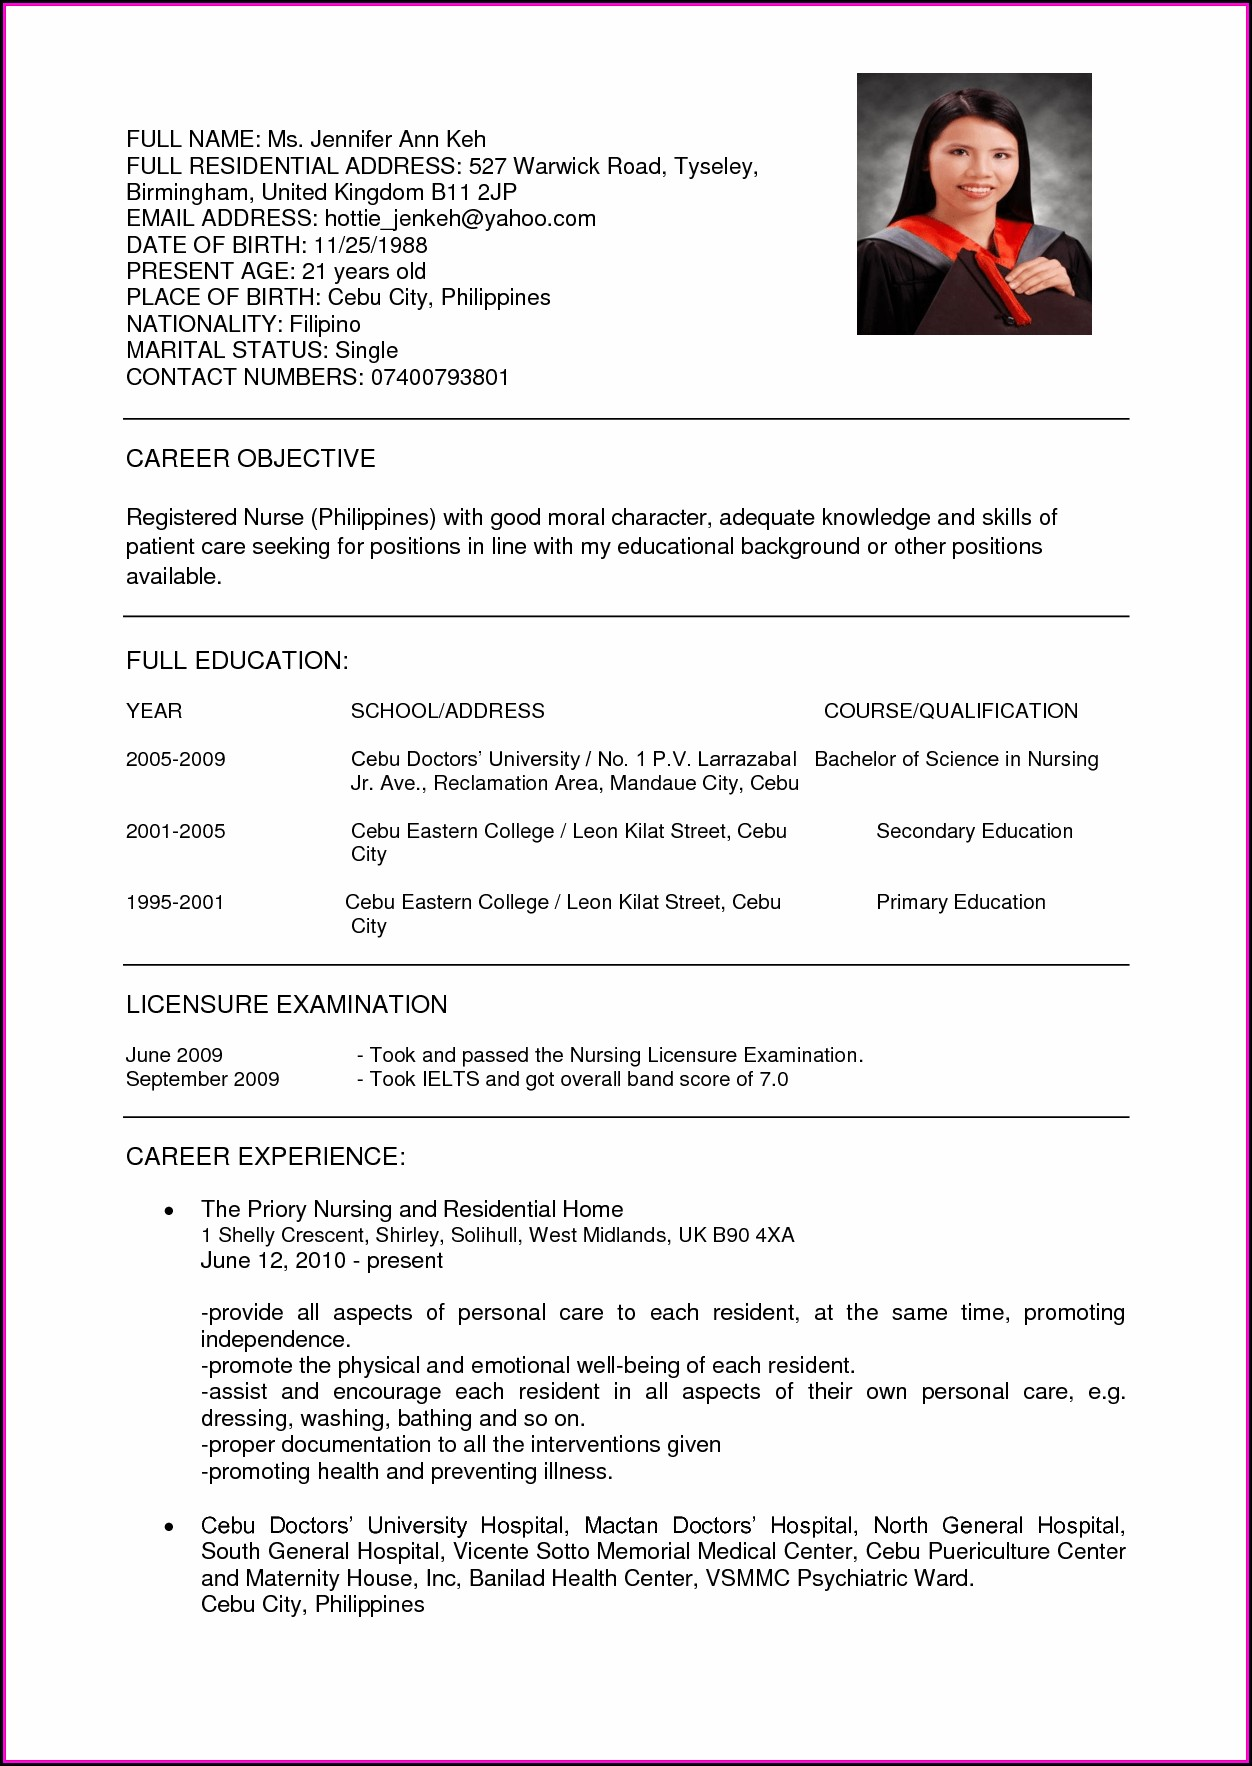 Curriculum Vitae Sample For Nurses